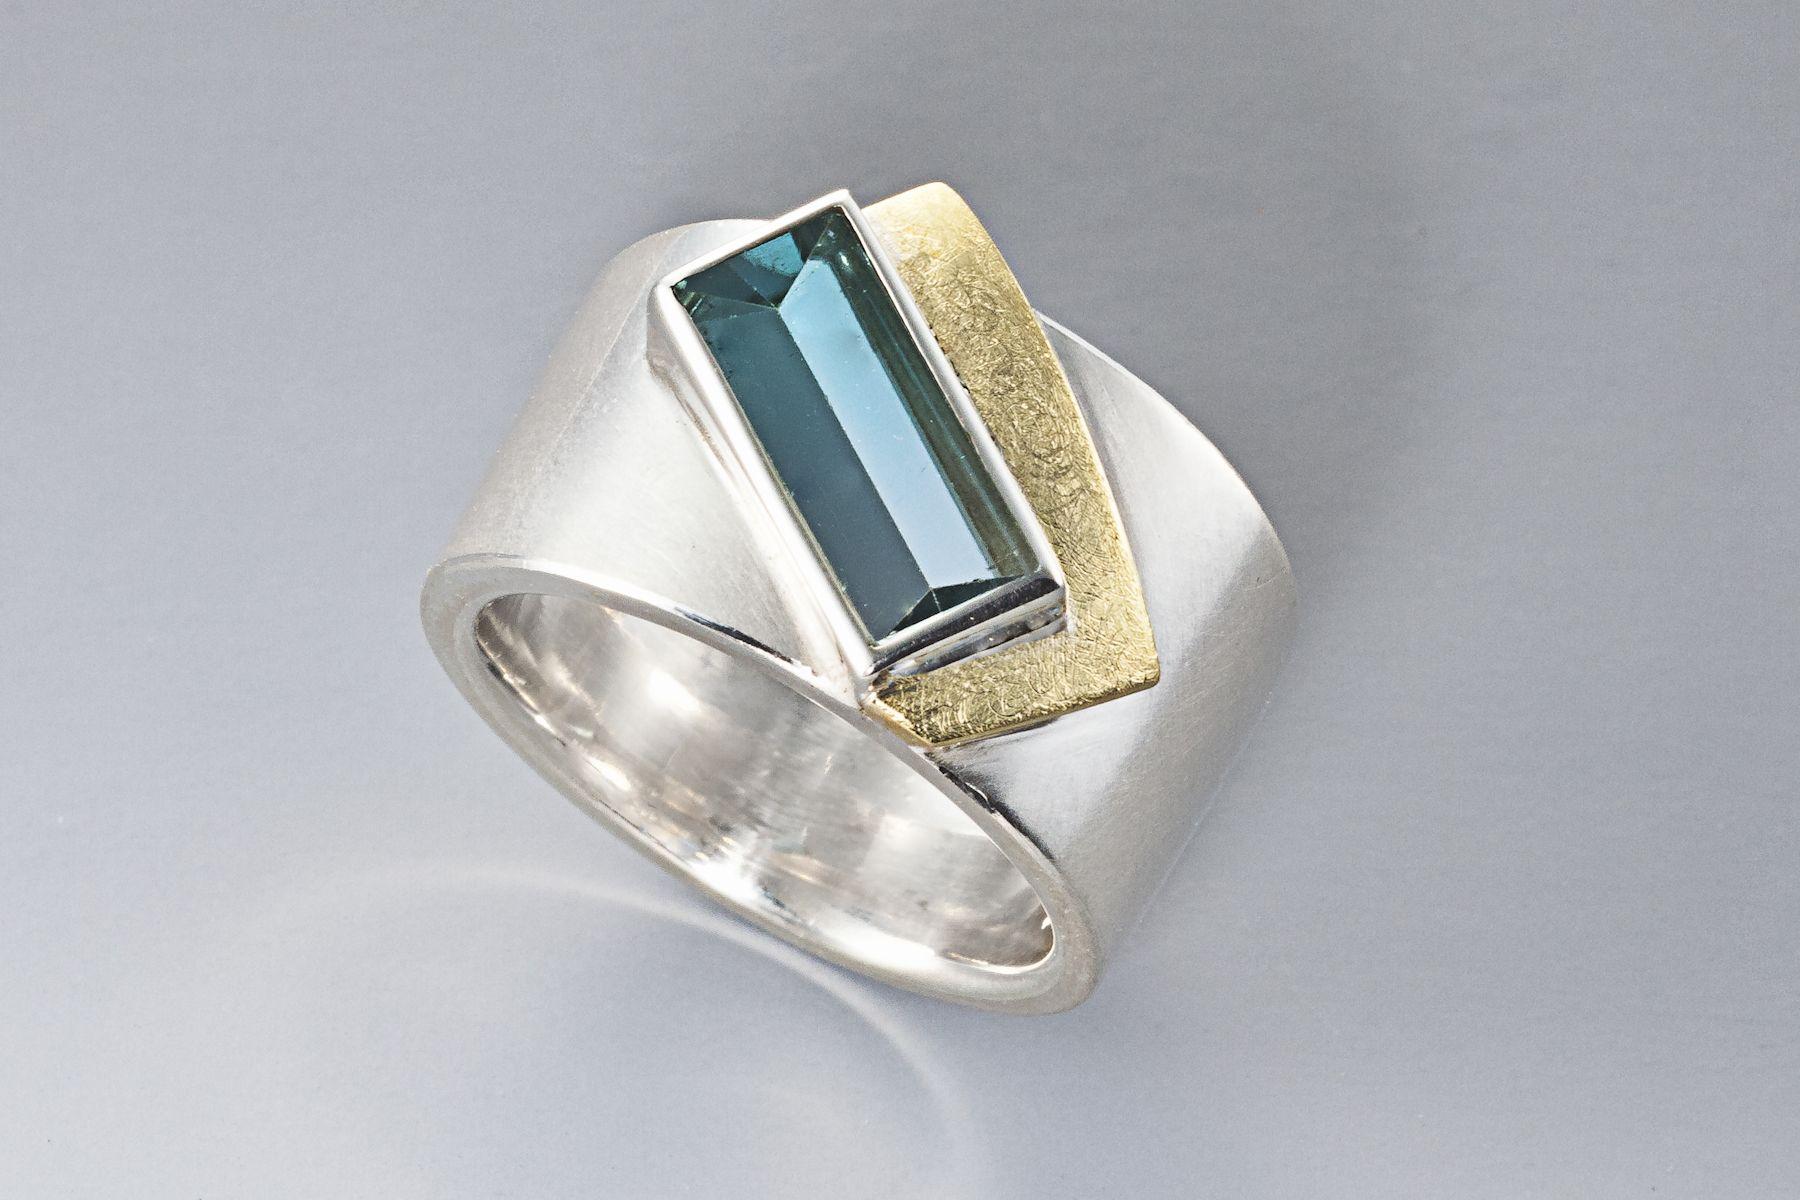 Ring Sterling silver, 18 carat gold, tourmaline